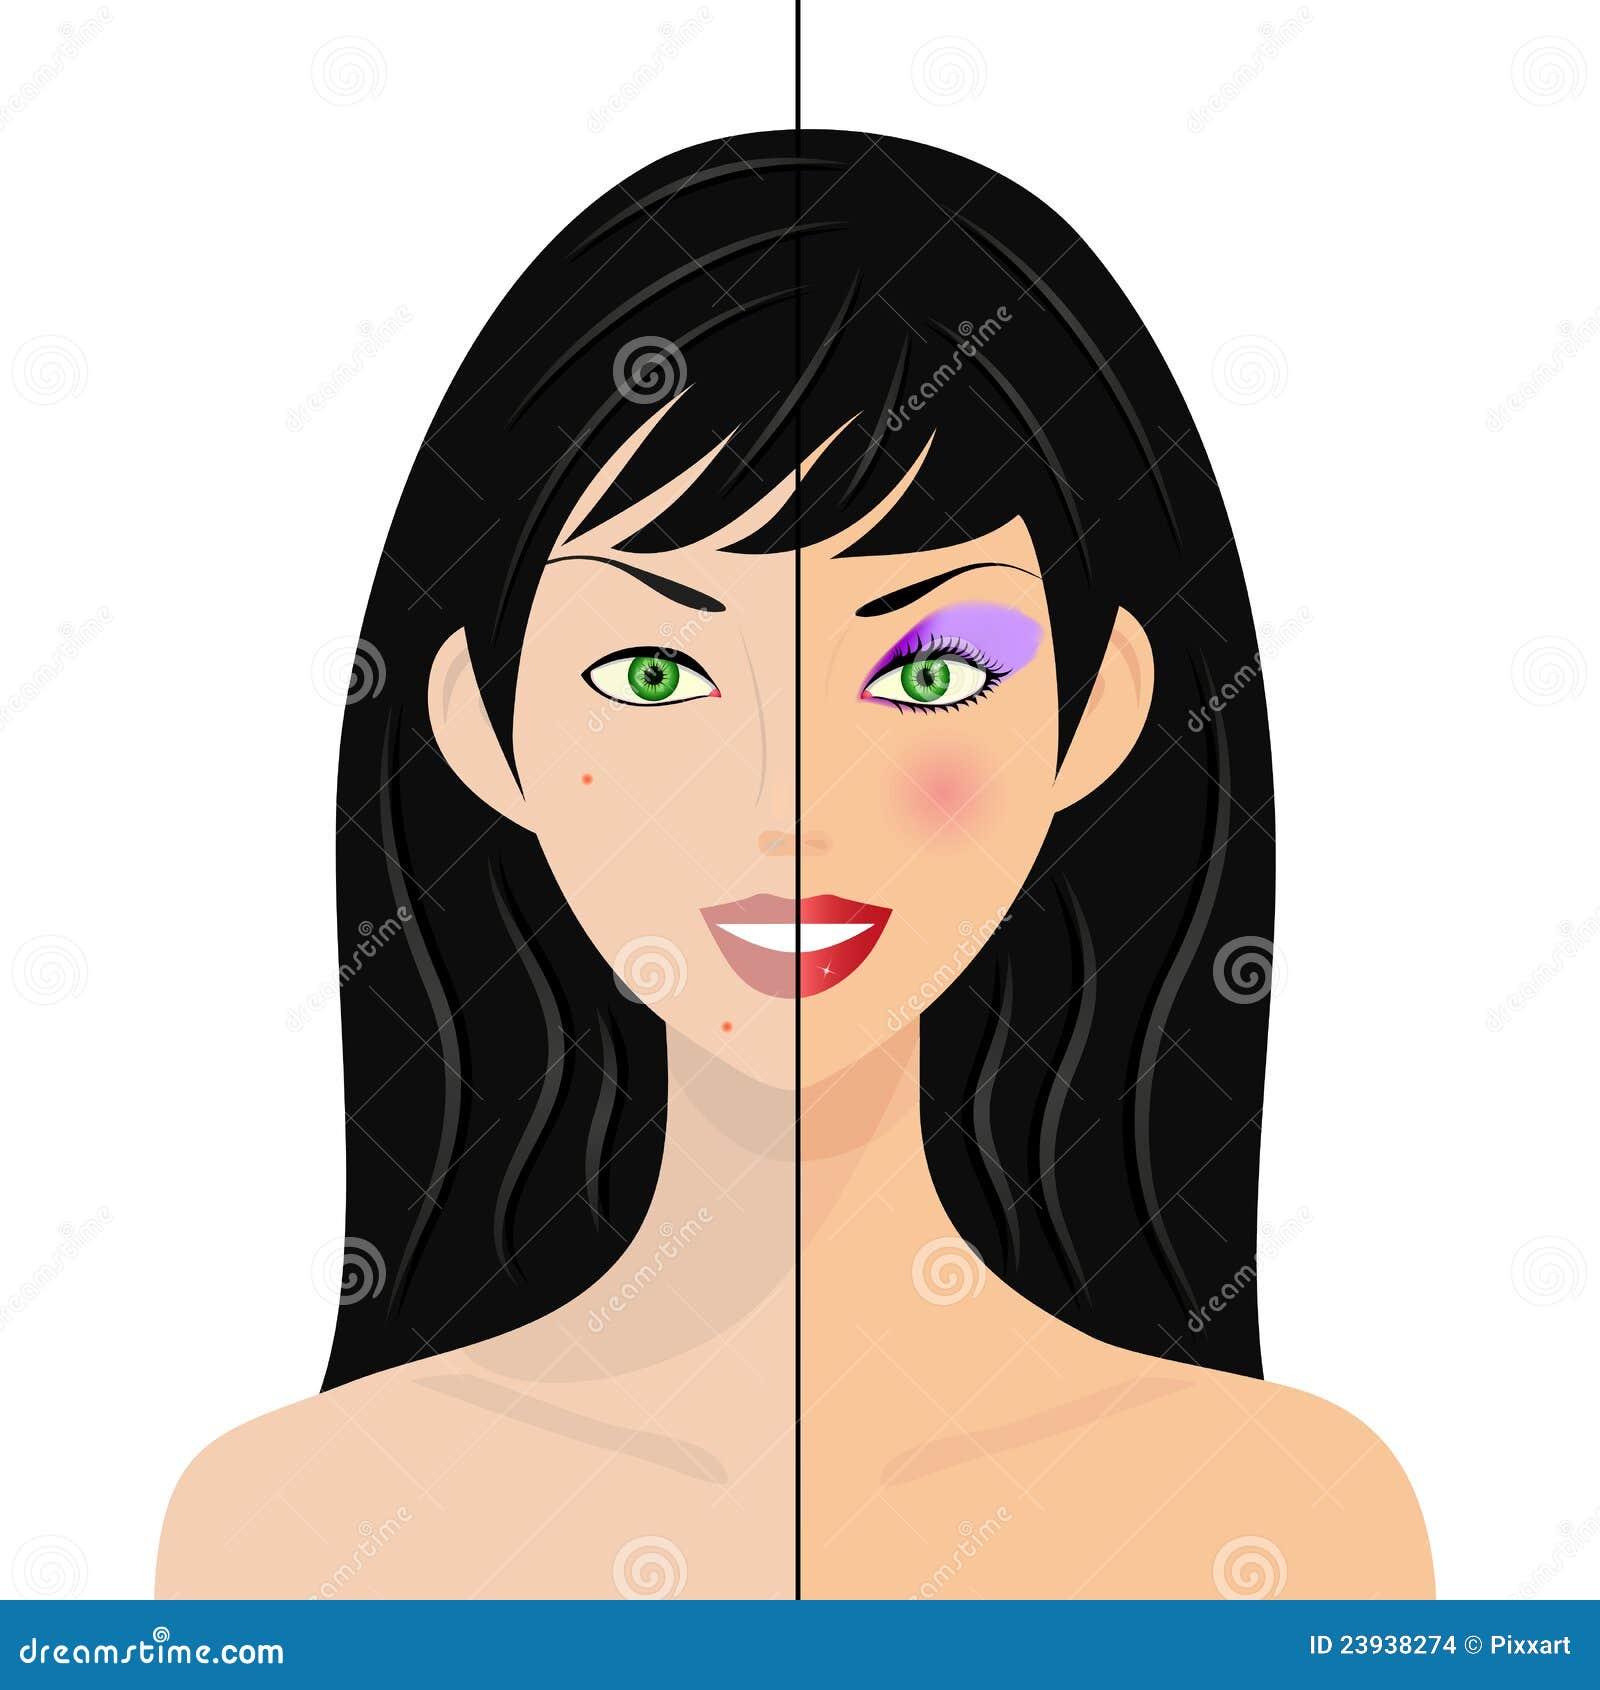 La mujer, medio natural, mitad con compone